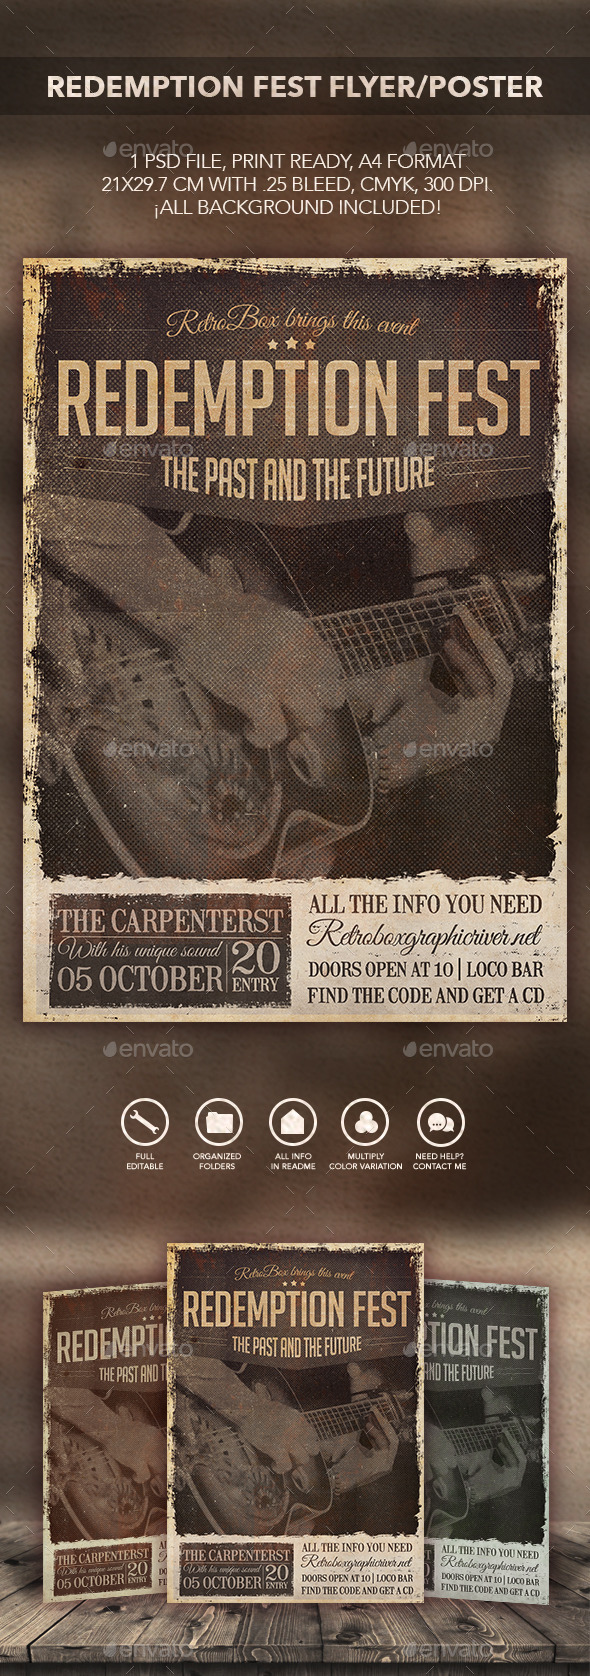 Redemption Fest Flyer Poster - Flyers Print Templates